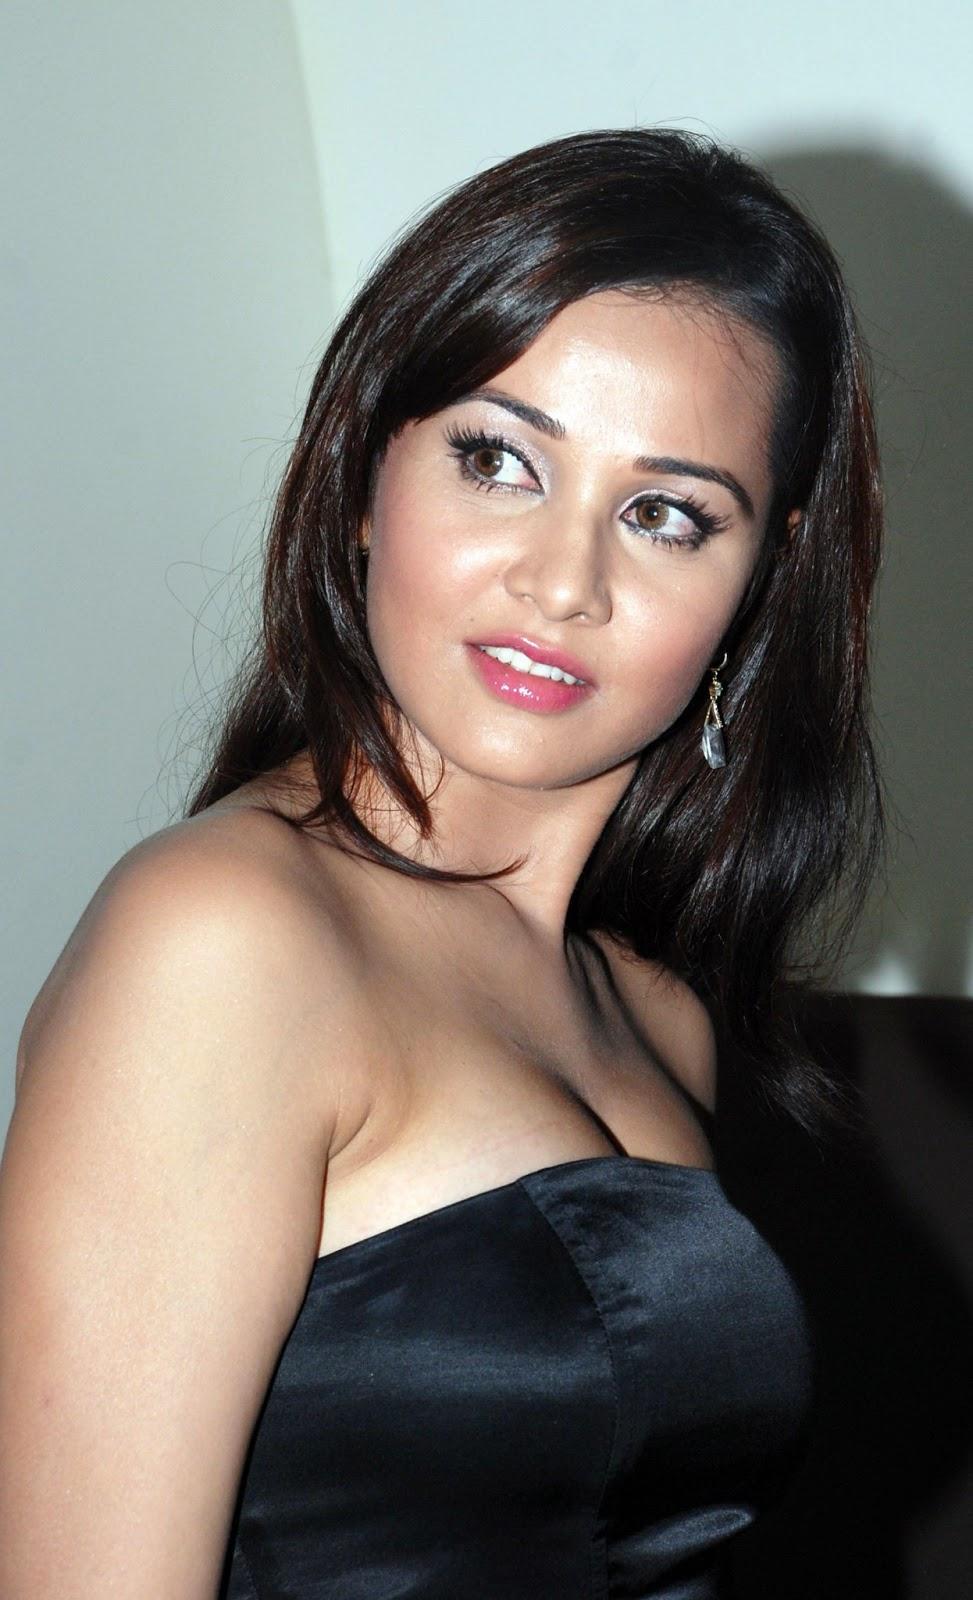 Beautiful Indian Girl Hd Wallpapers 1080p Hd Pc Desktop Wallpapers Priyanka Kothari Hd Wallpapers